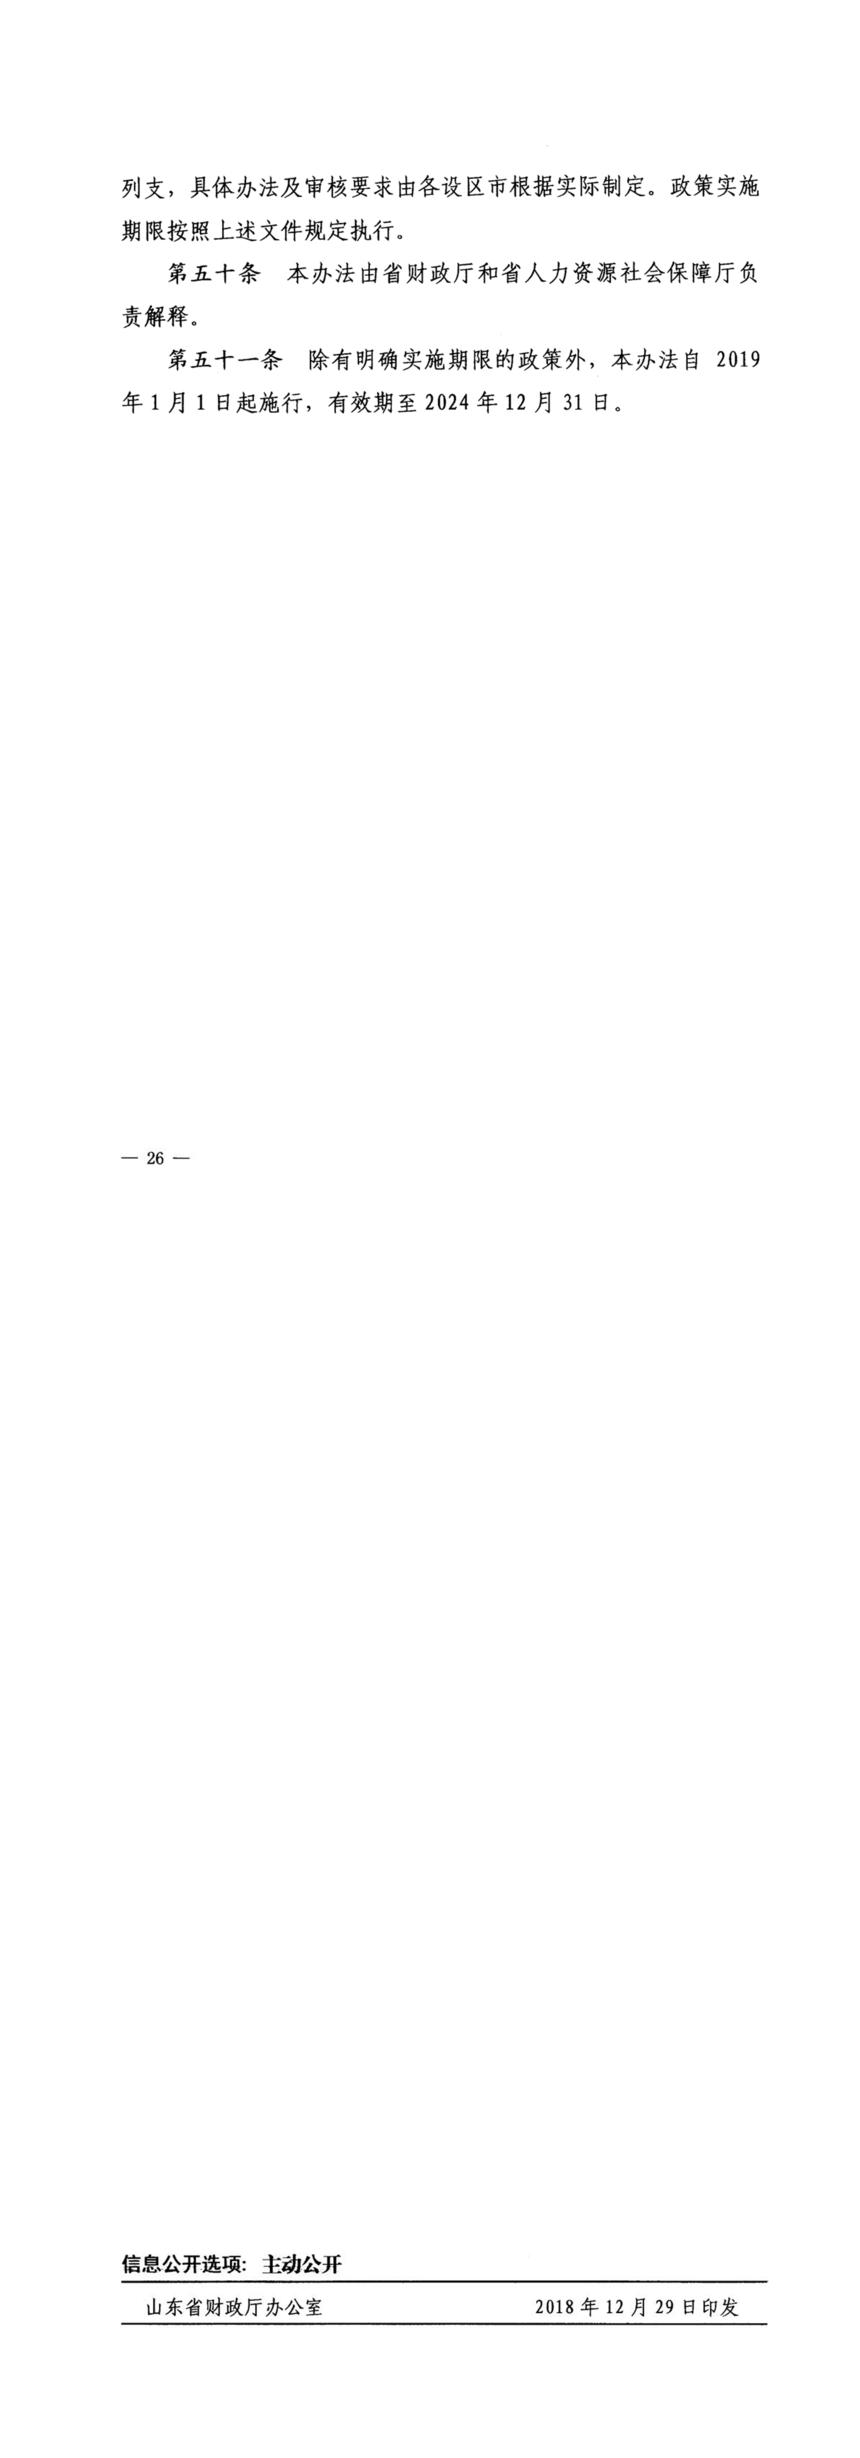 文件一(26-尾页).png